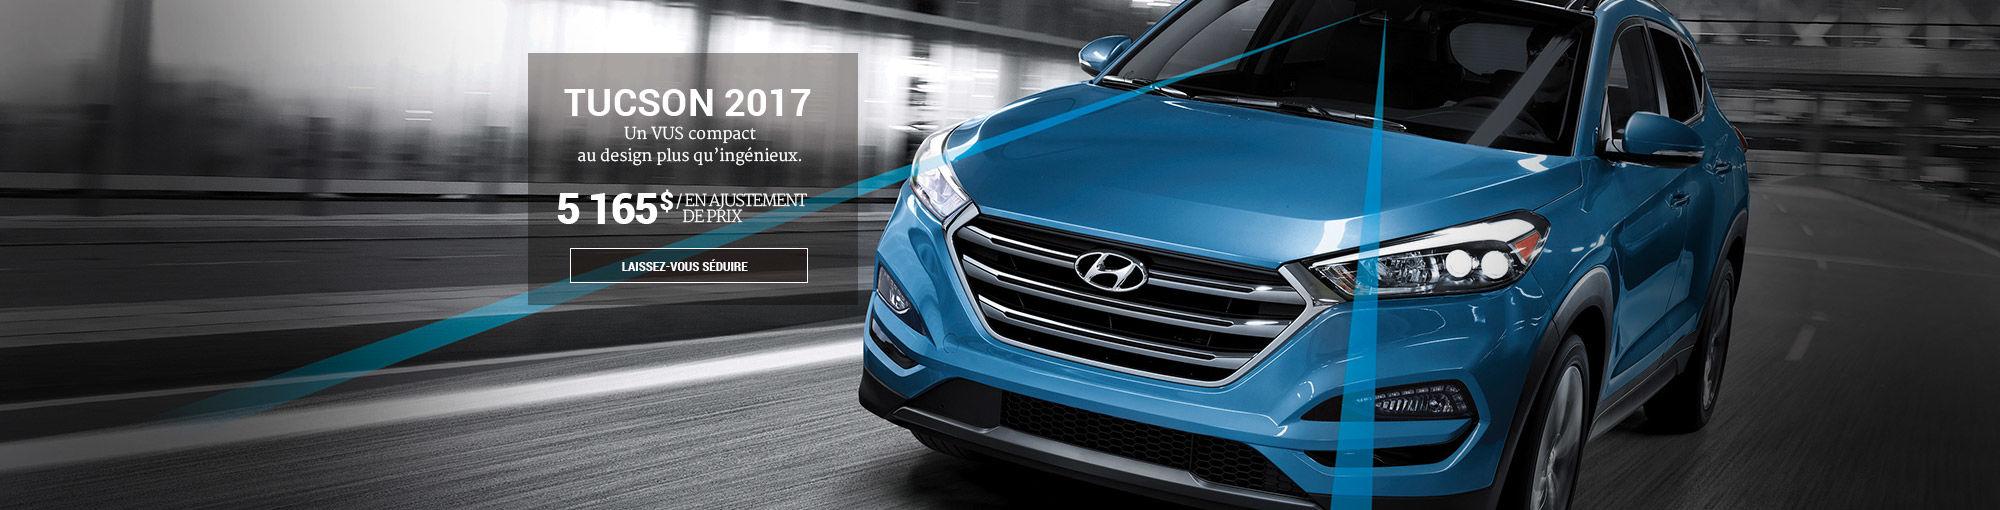 Hyundai Tucson 2016 header - octobre 2016 htr et hsh